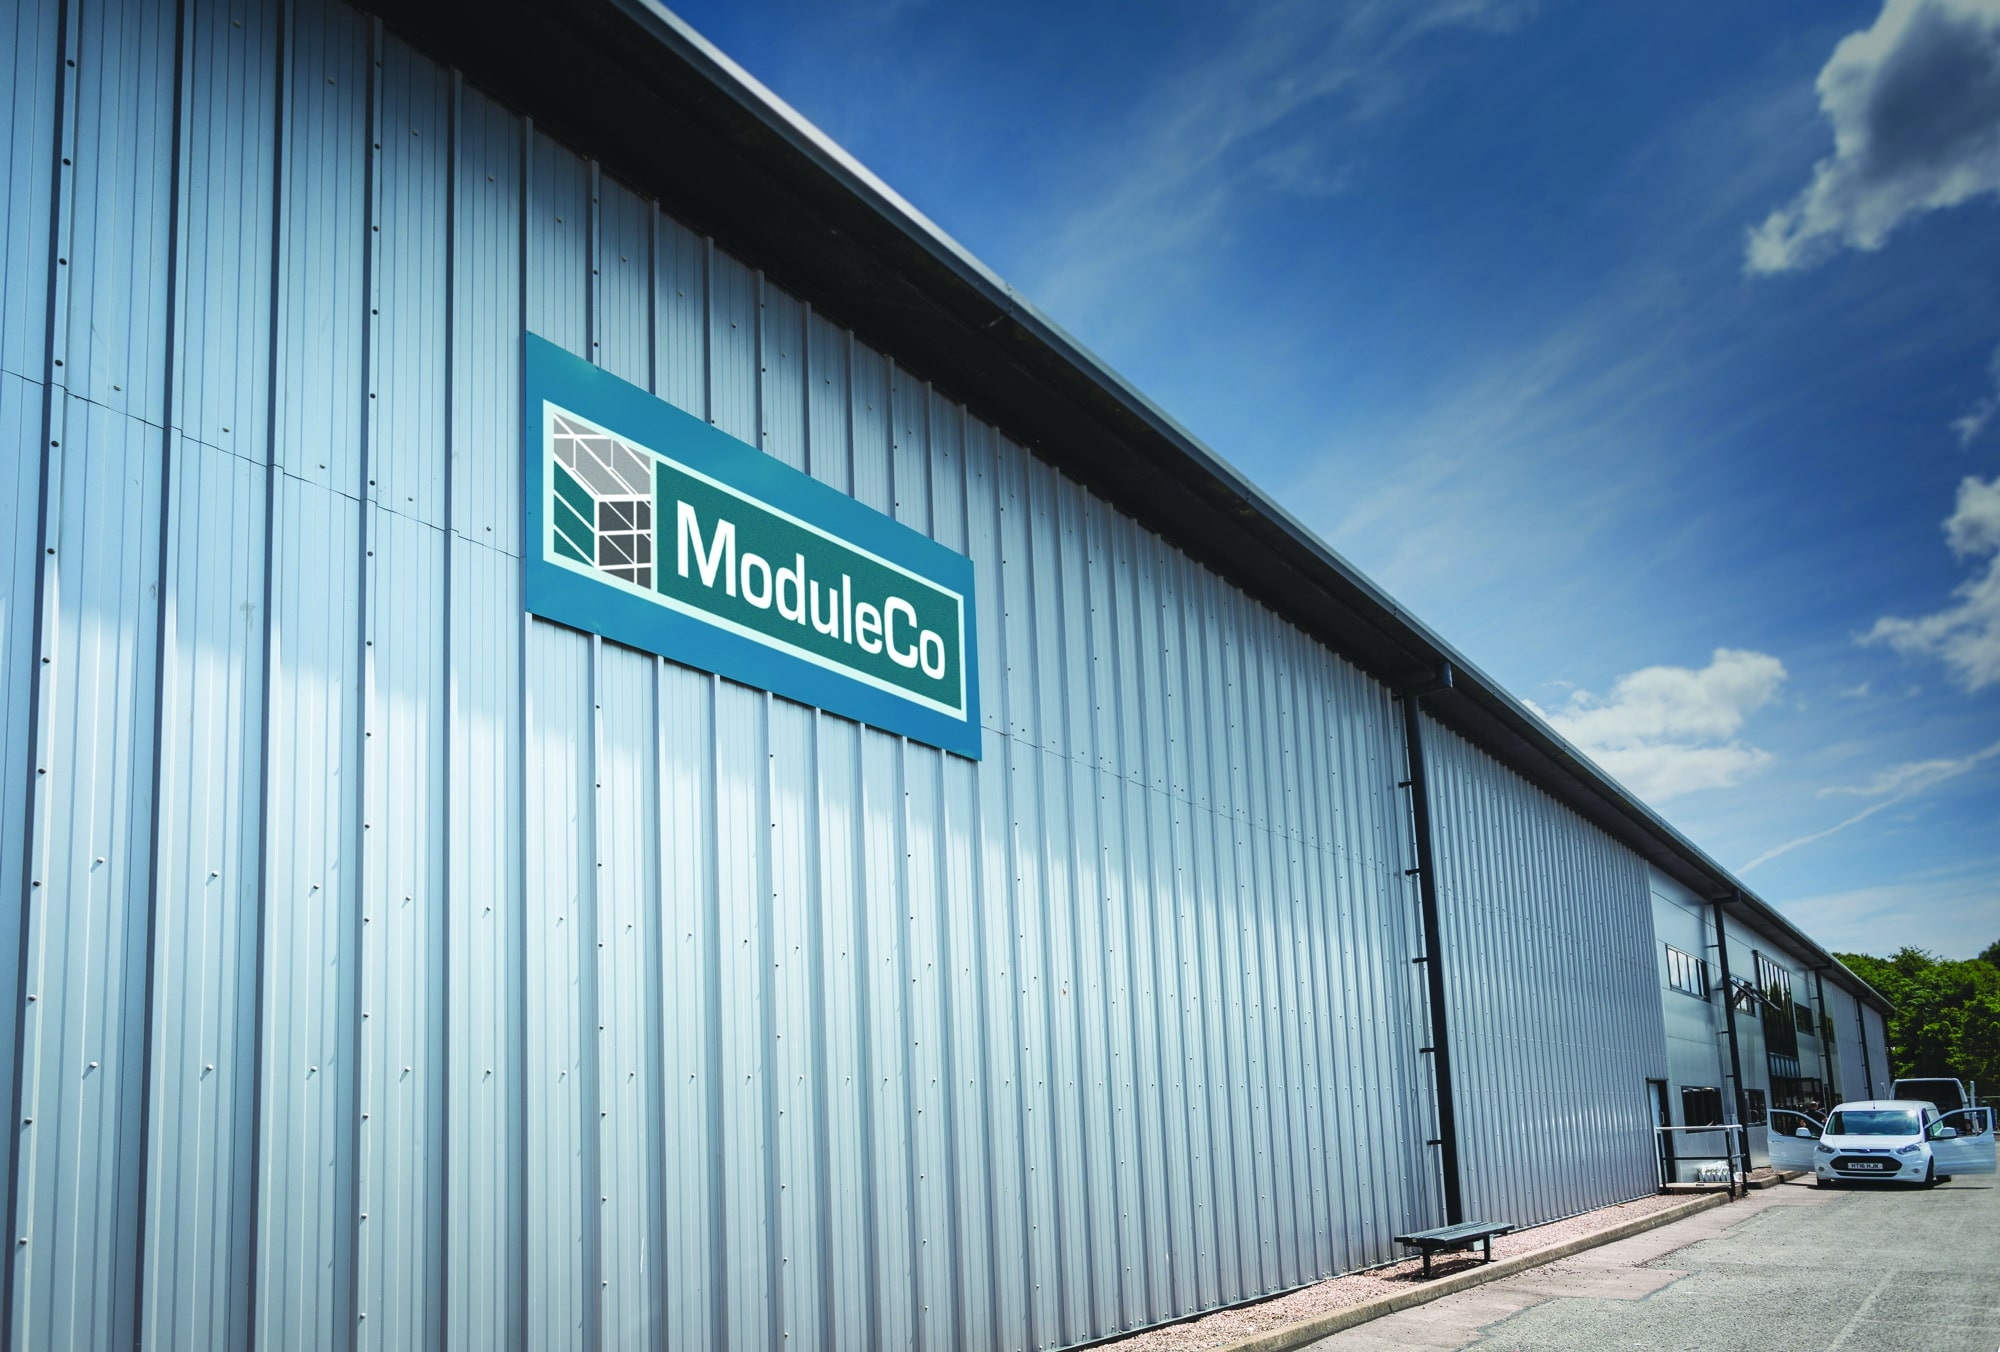 ModuleCo Off-Site Modular Factory Facility Image